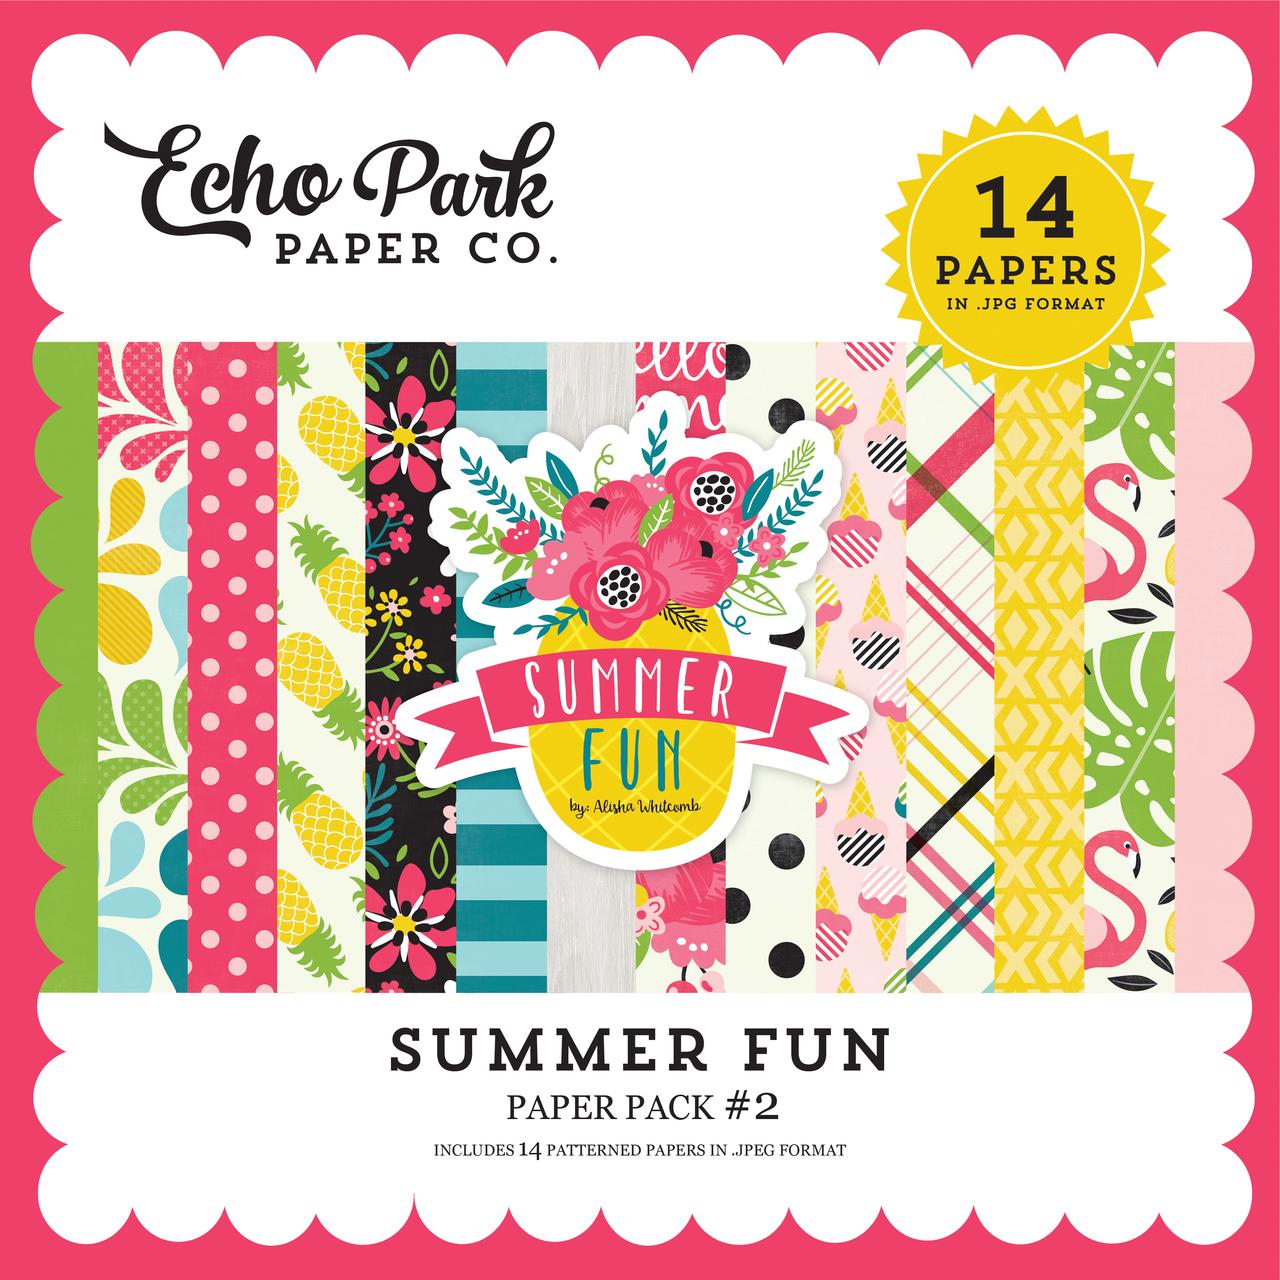 Summer Fun Paper Pack #2